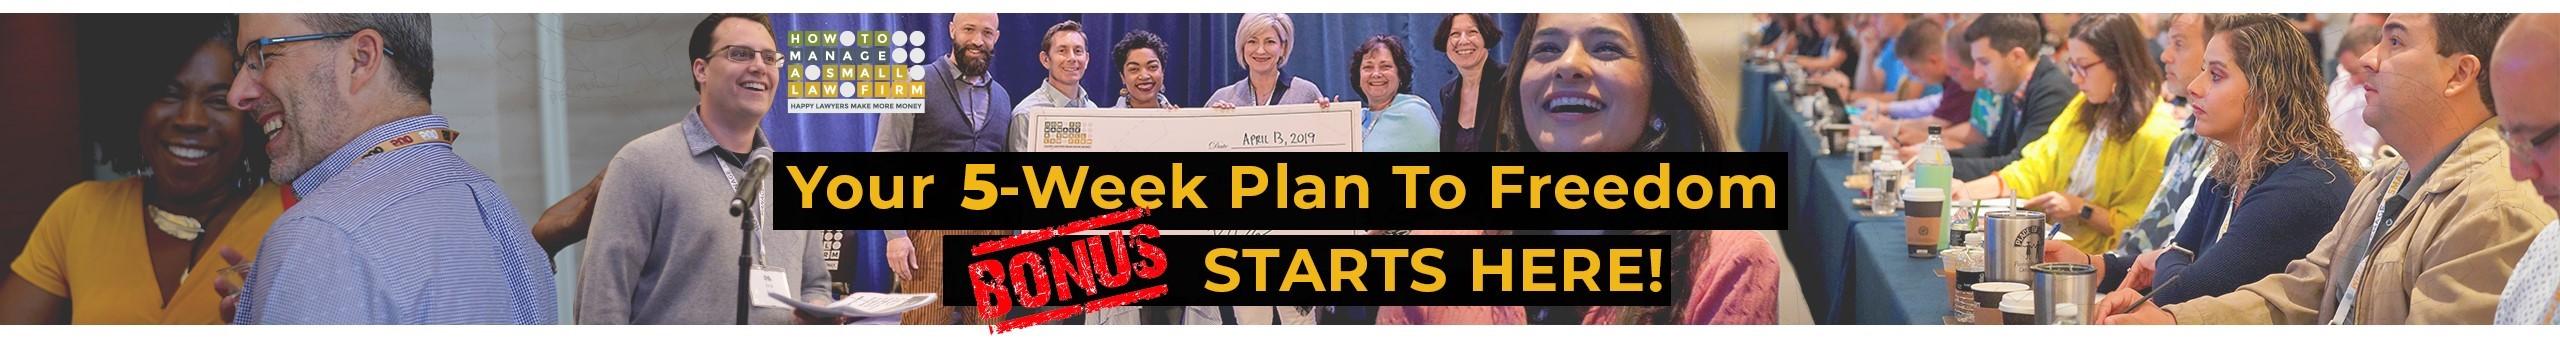 Your 5-Week Plan to Freedom Bonus Starts Here!